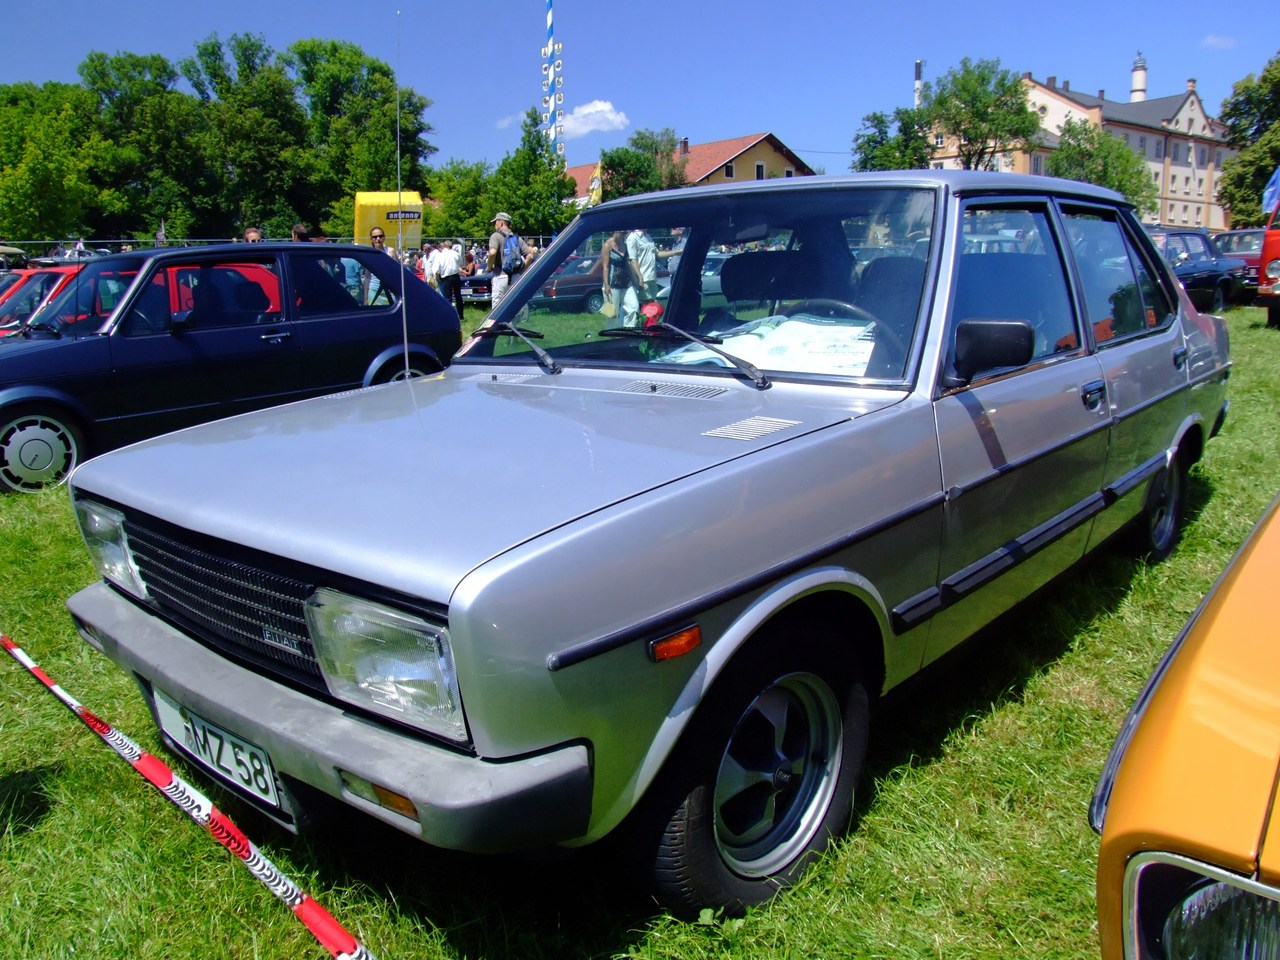 1979 fiat 131 supermirafiori 98ps?w=840 fiat history part iv 1966 1979 myn transport blog 2017 Fiat Spider at readyjetset.co